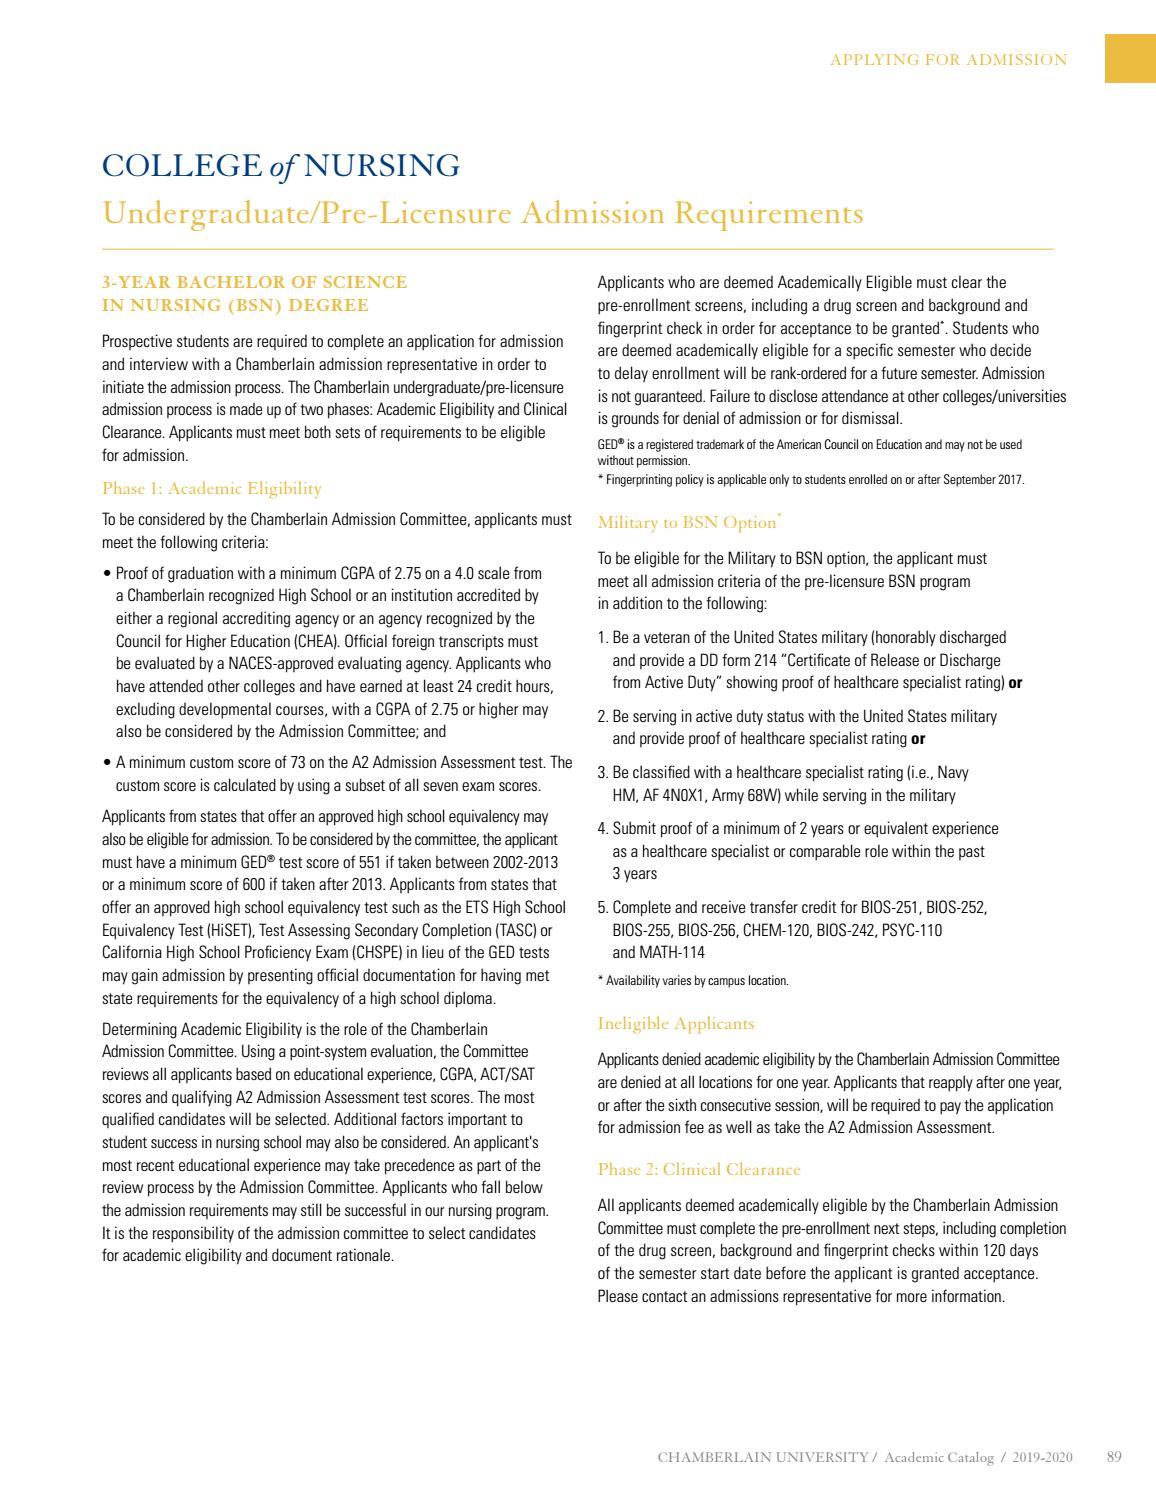 Chamberlain University Academic Catalog by Chamberlain